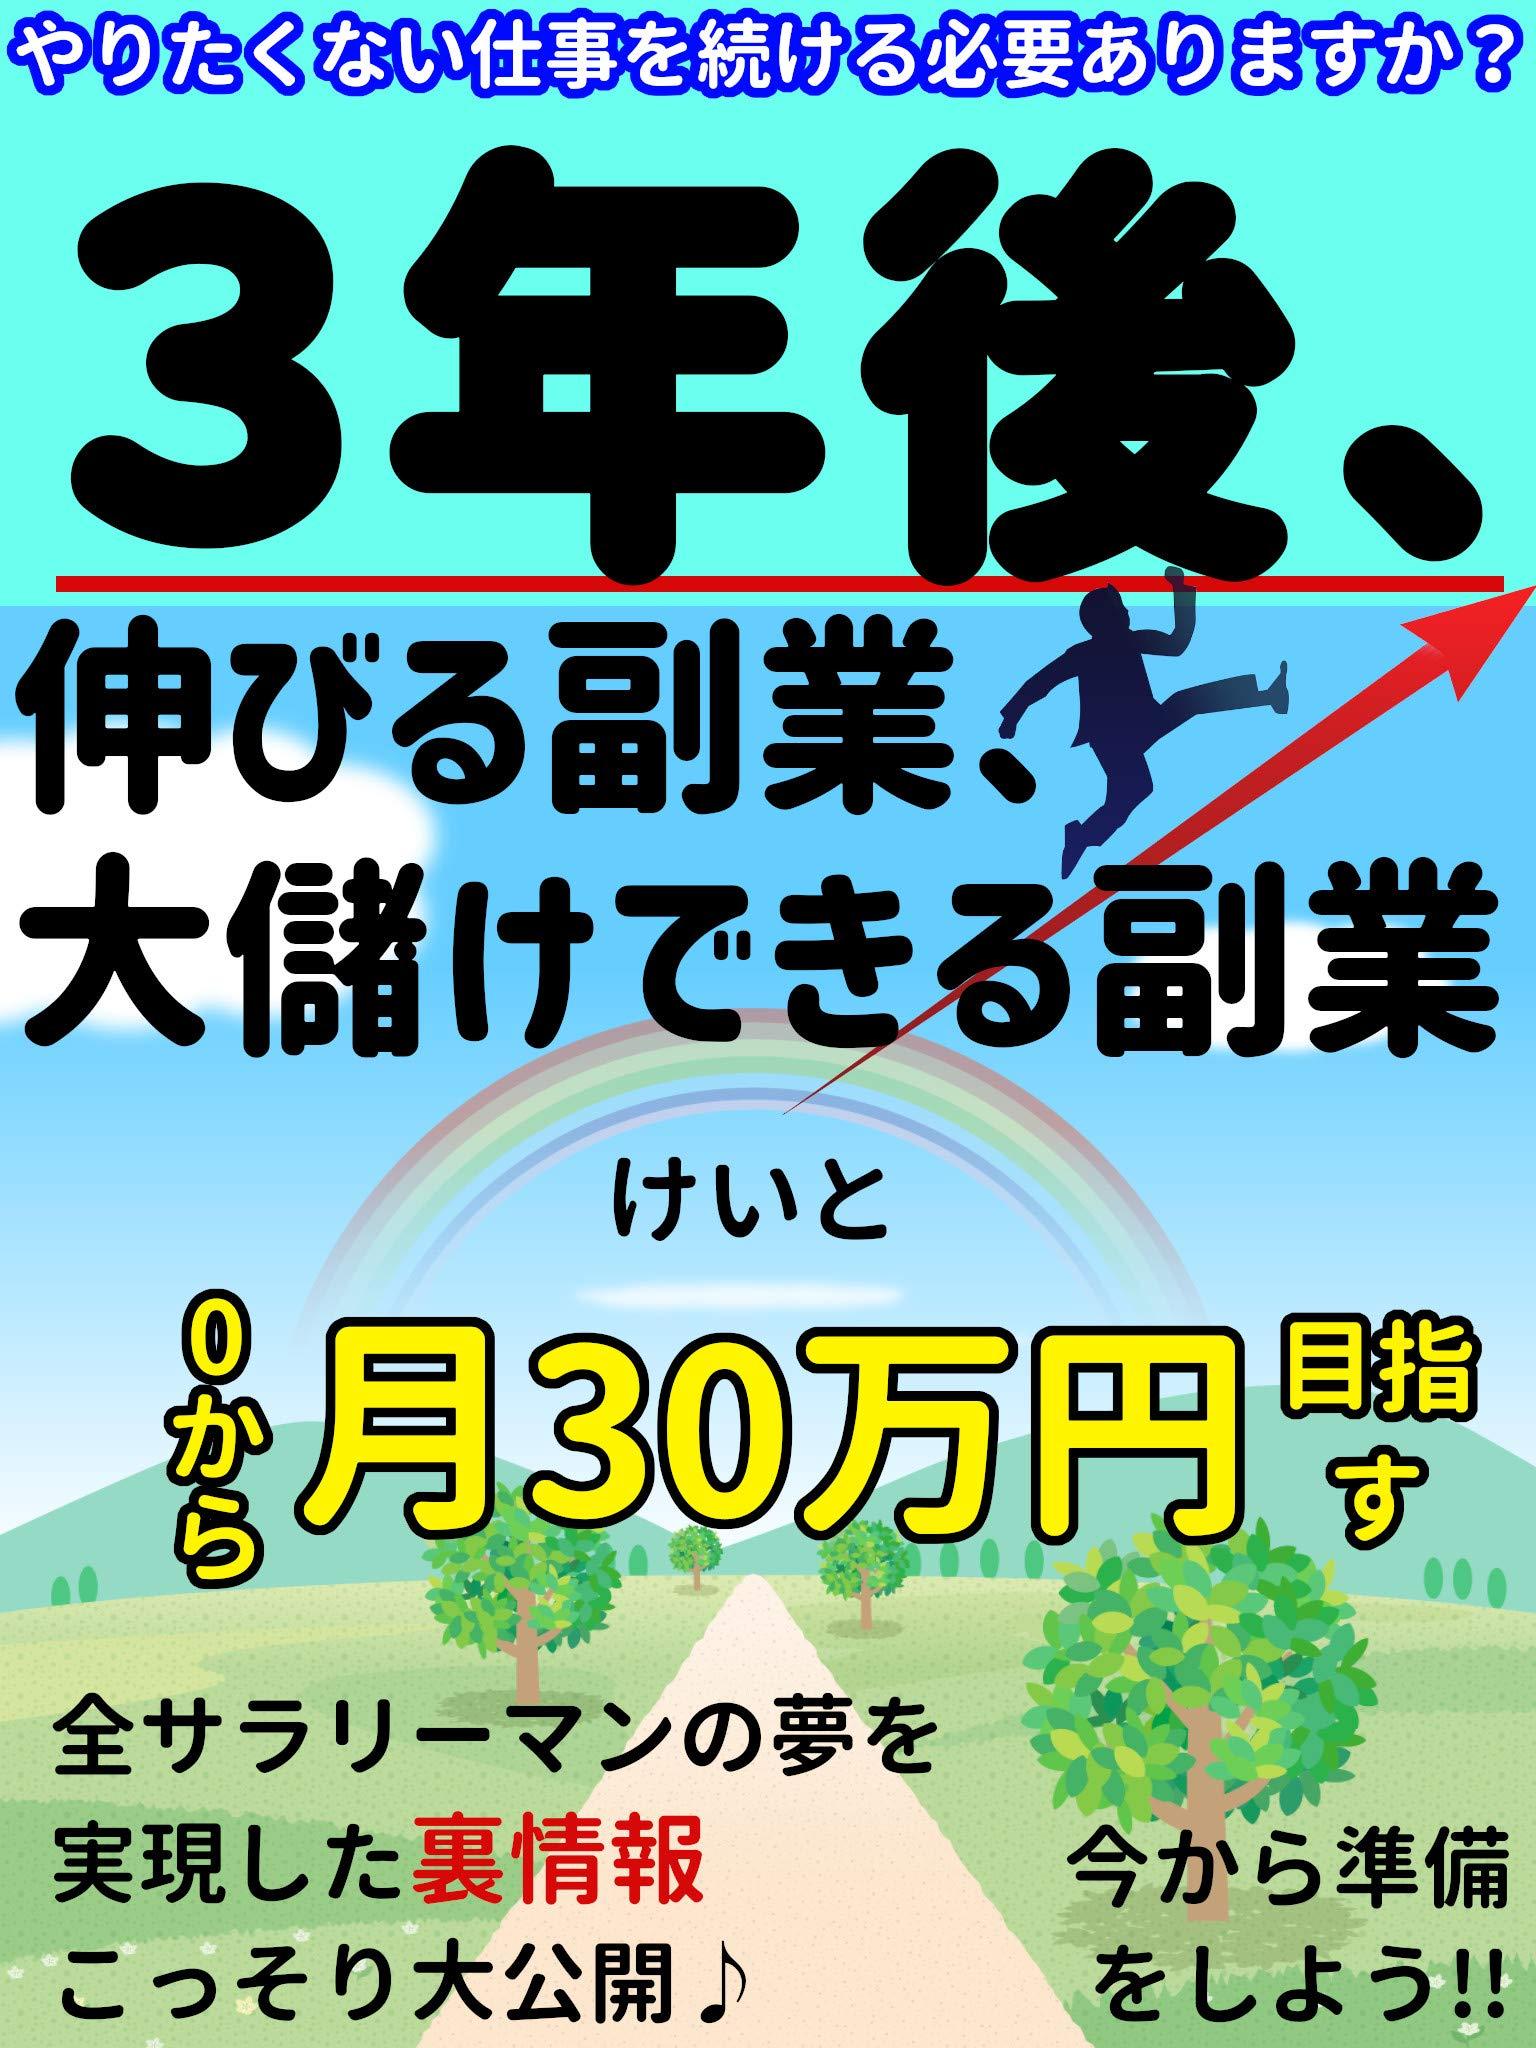 sannnenngonobirufukugyouoomoukedekirufukugyou: yaritakunaisigotowotudukeruhituyouarimasuka (Japanese Edition)